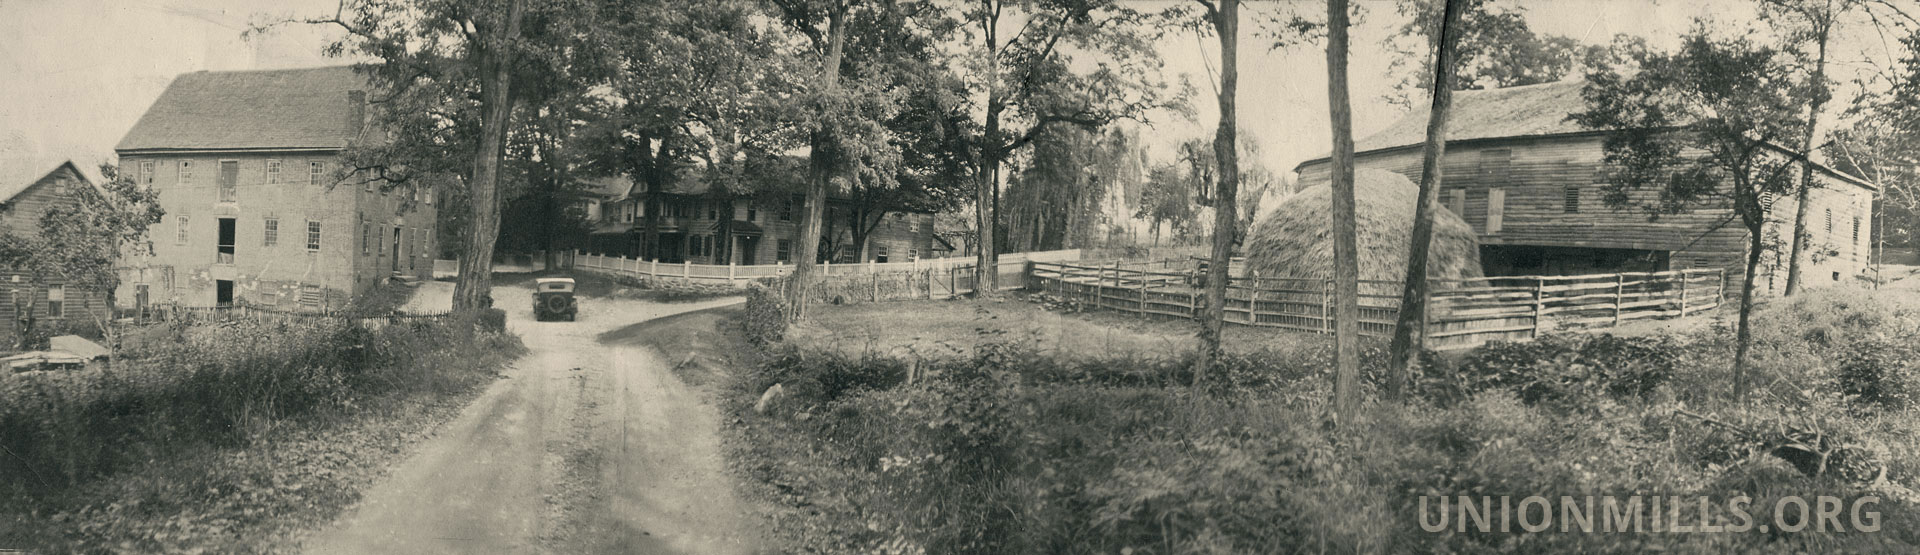 Union Mills panorama